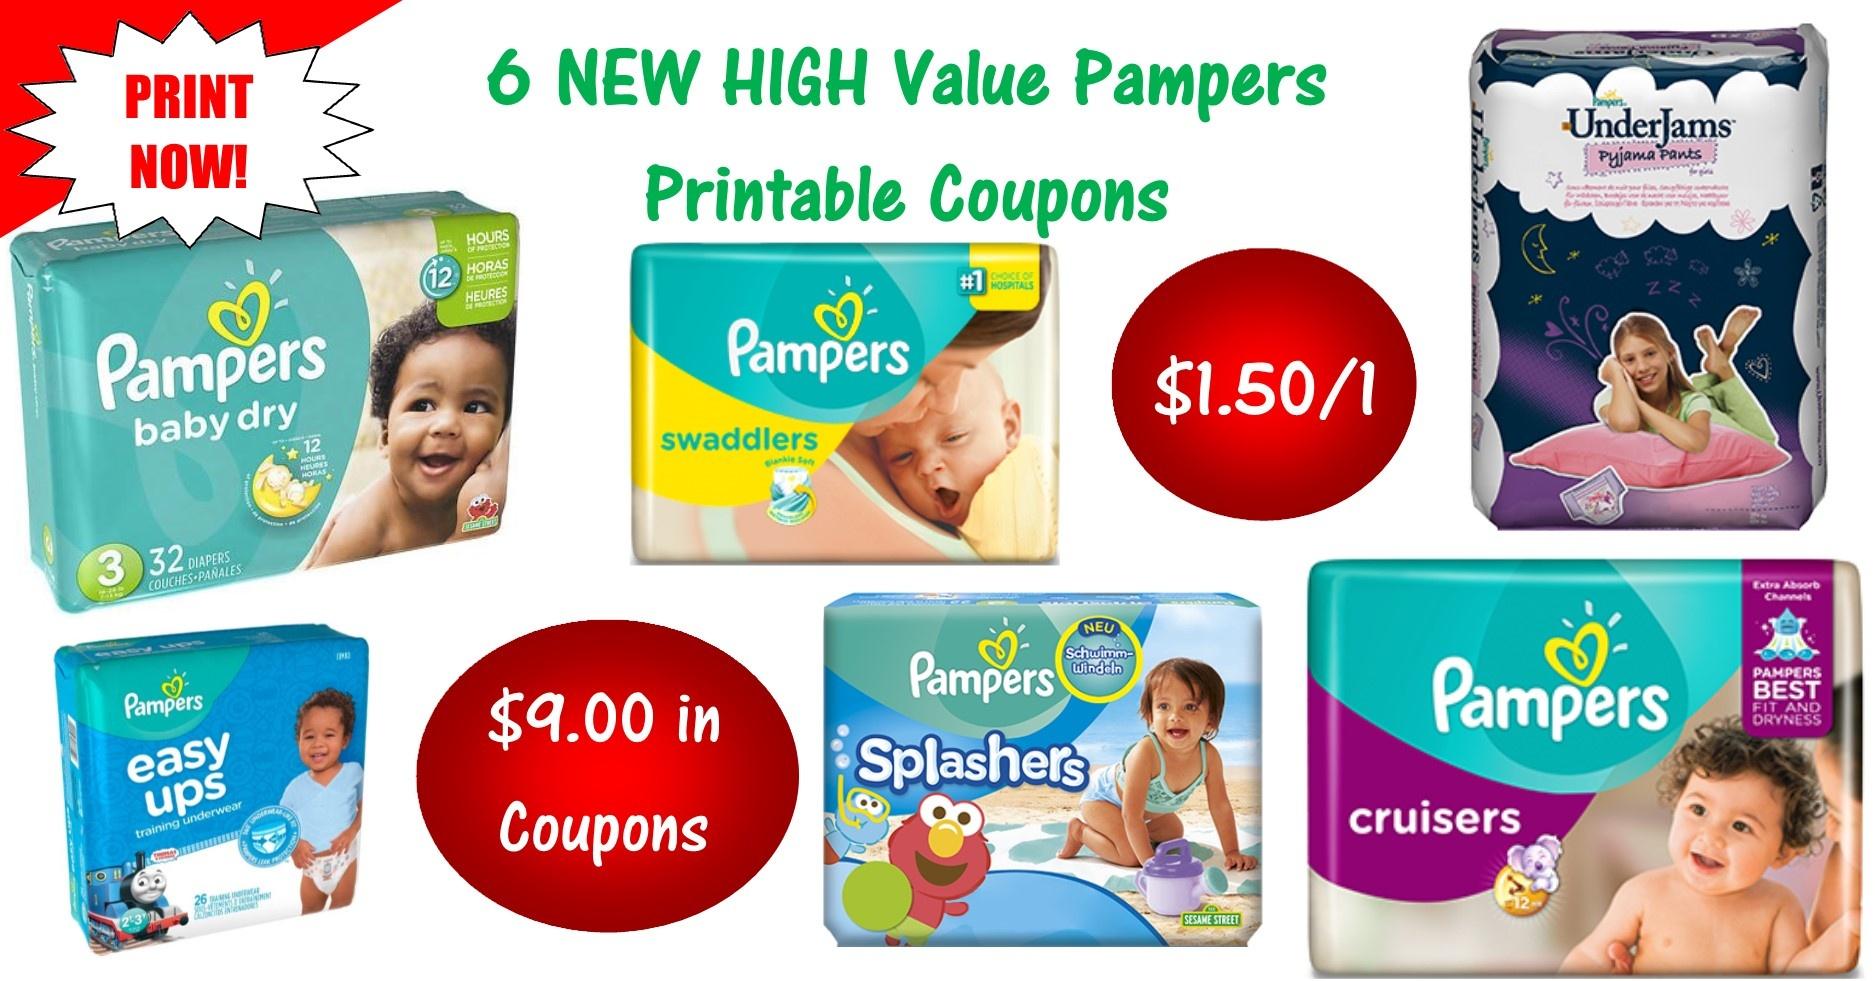 6 Pampers Printable Coupons ~ Print Now! $9 In Savings! - Free Printable Pampers Swaddlers Coupons